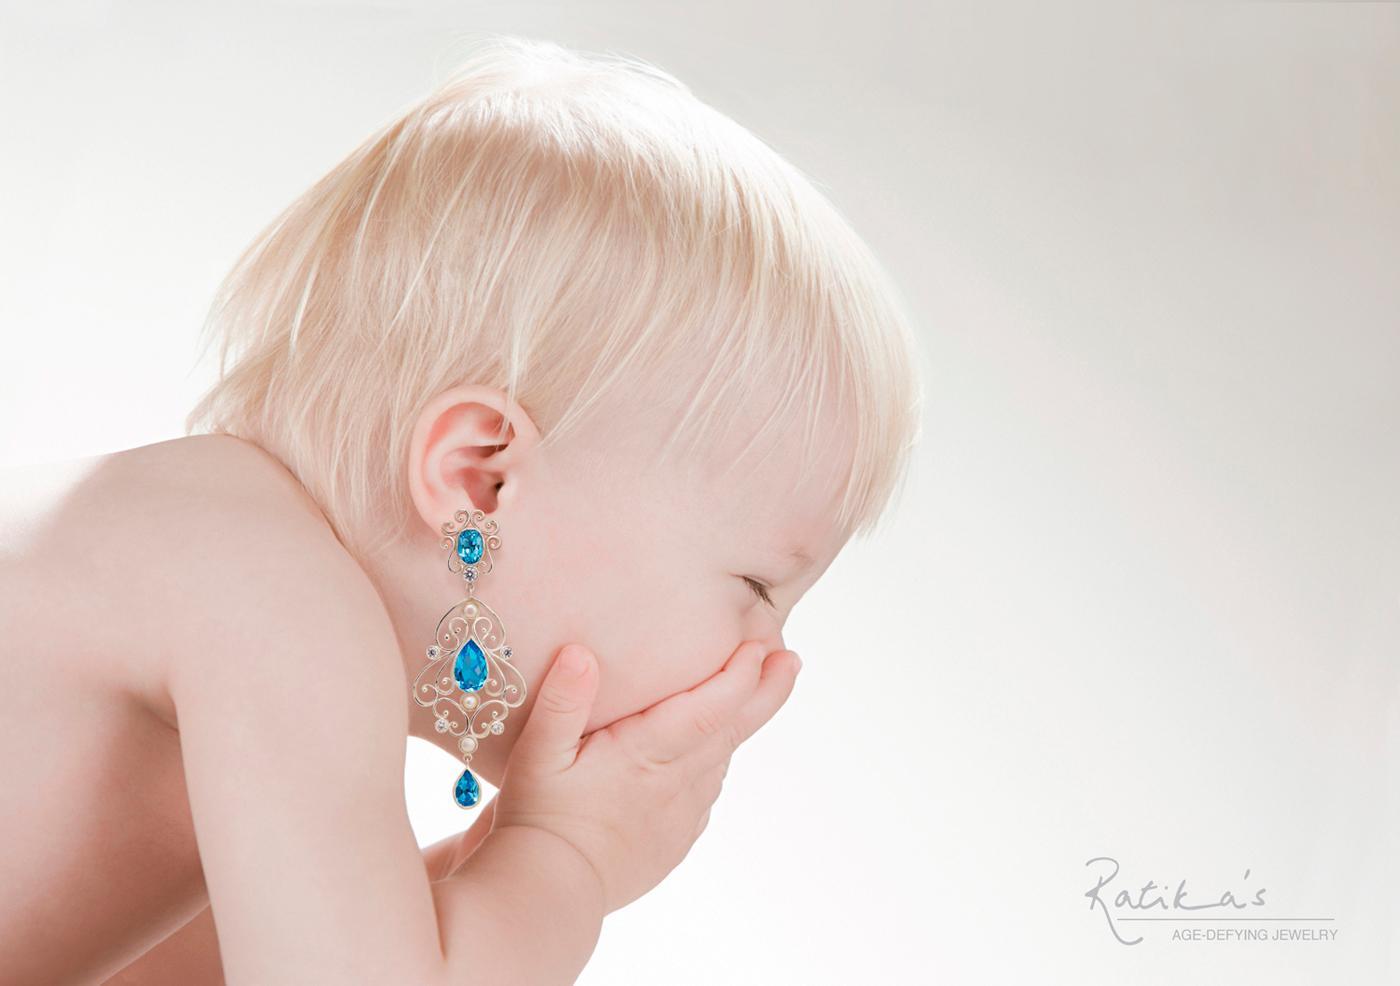 Ratika's Print Ad -  Age-defying jewelry